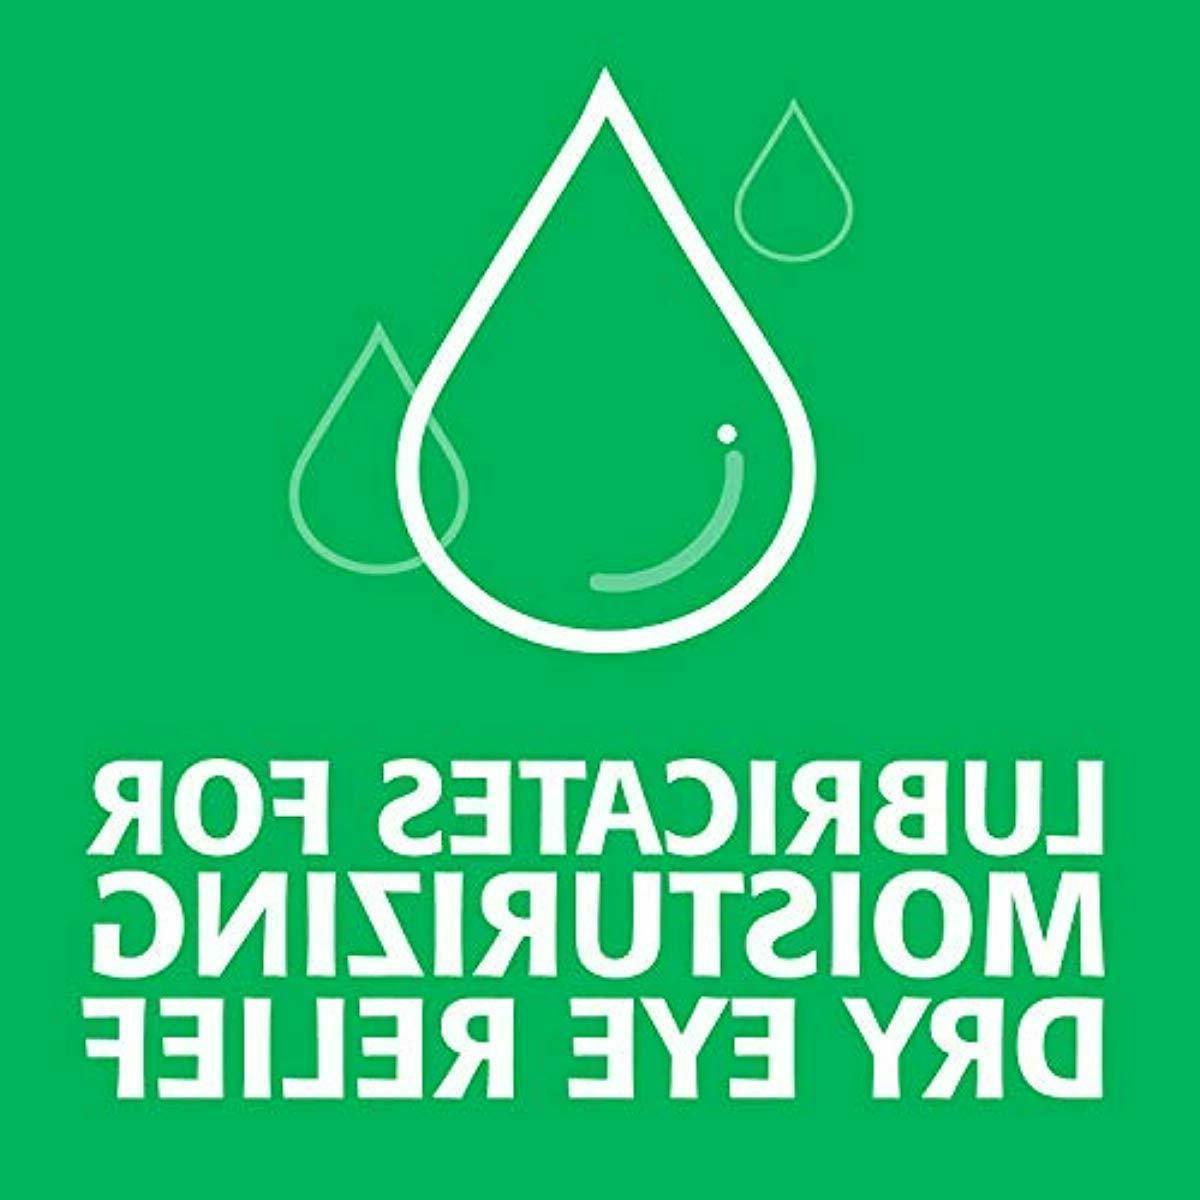 Refresh Lubricant Drops, 2 Bottles 0.5 fl oz Sterile